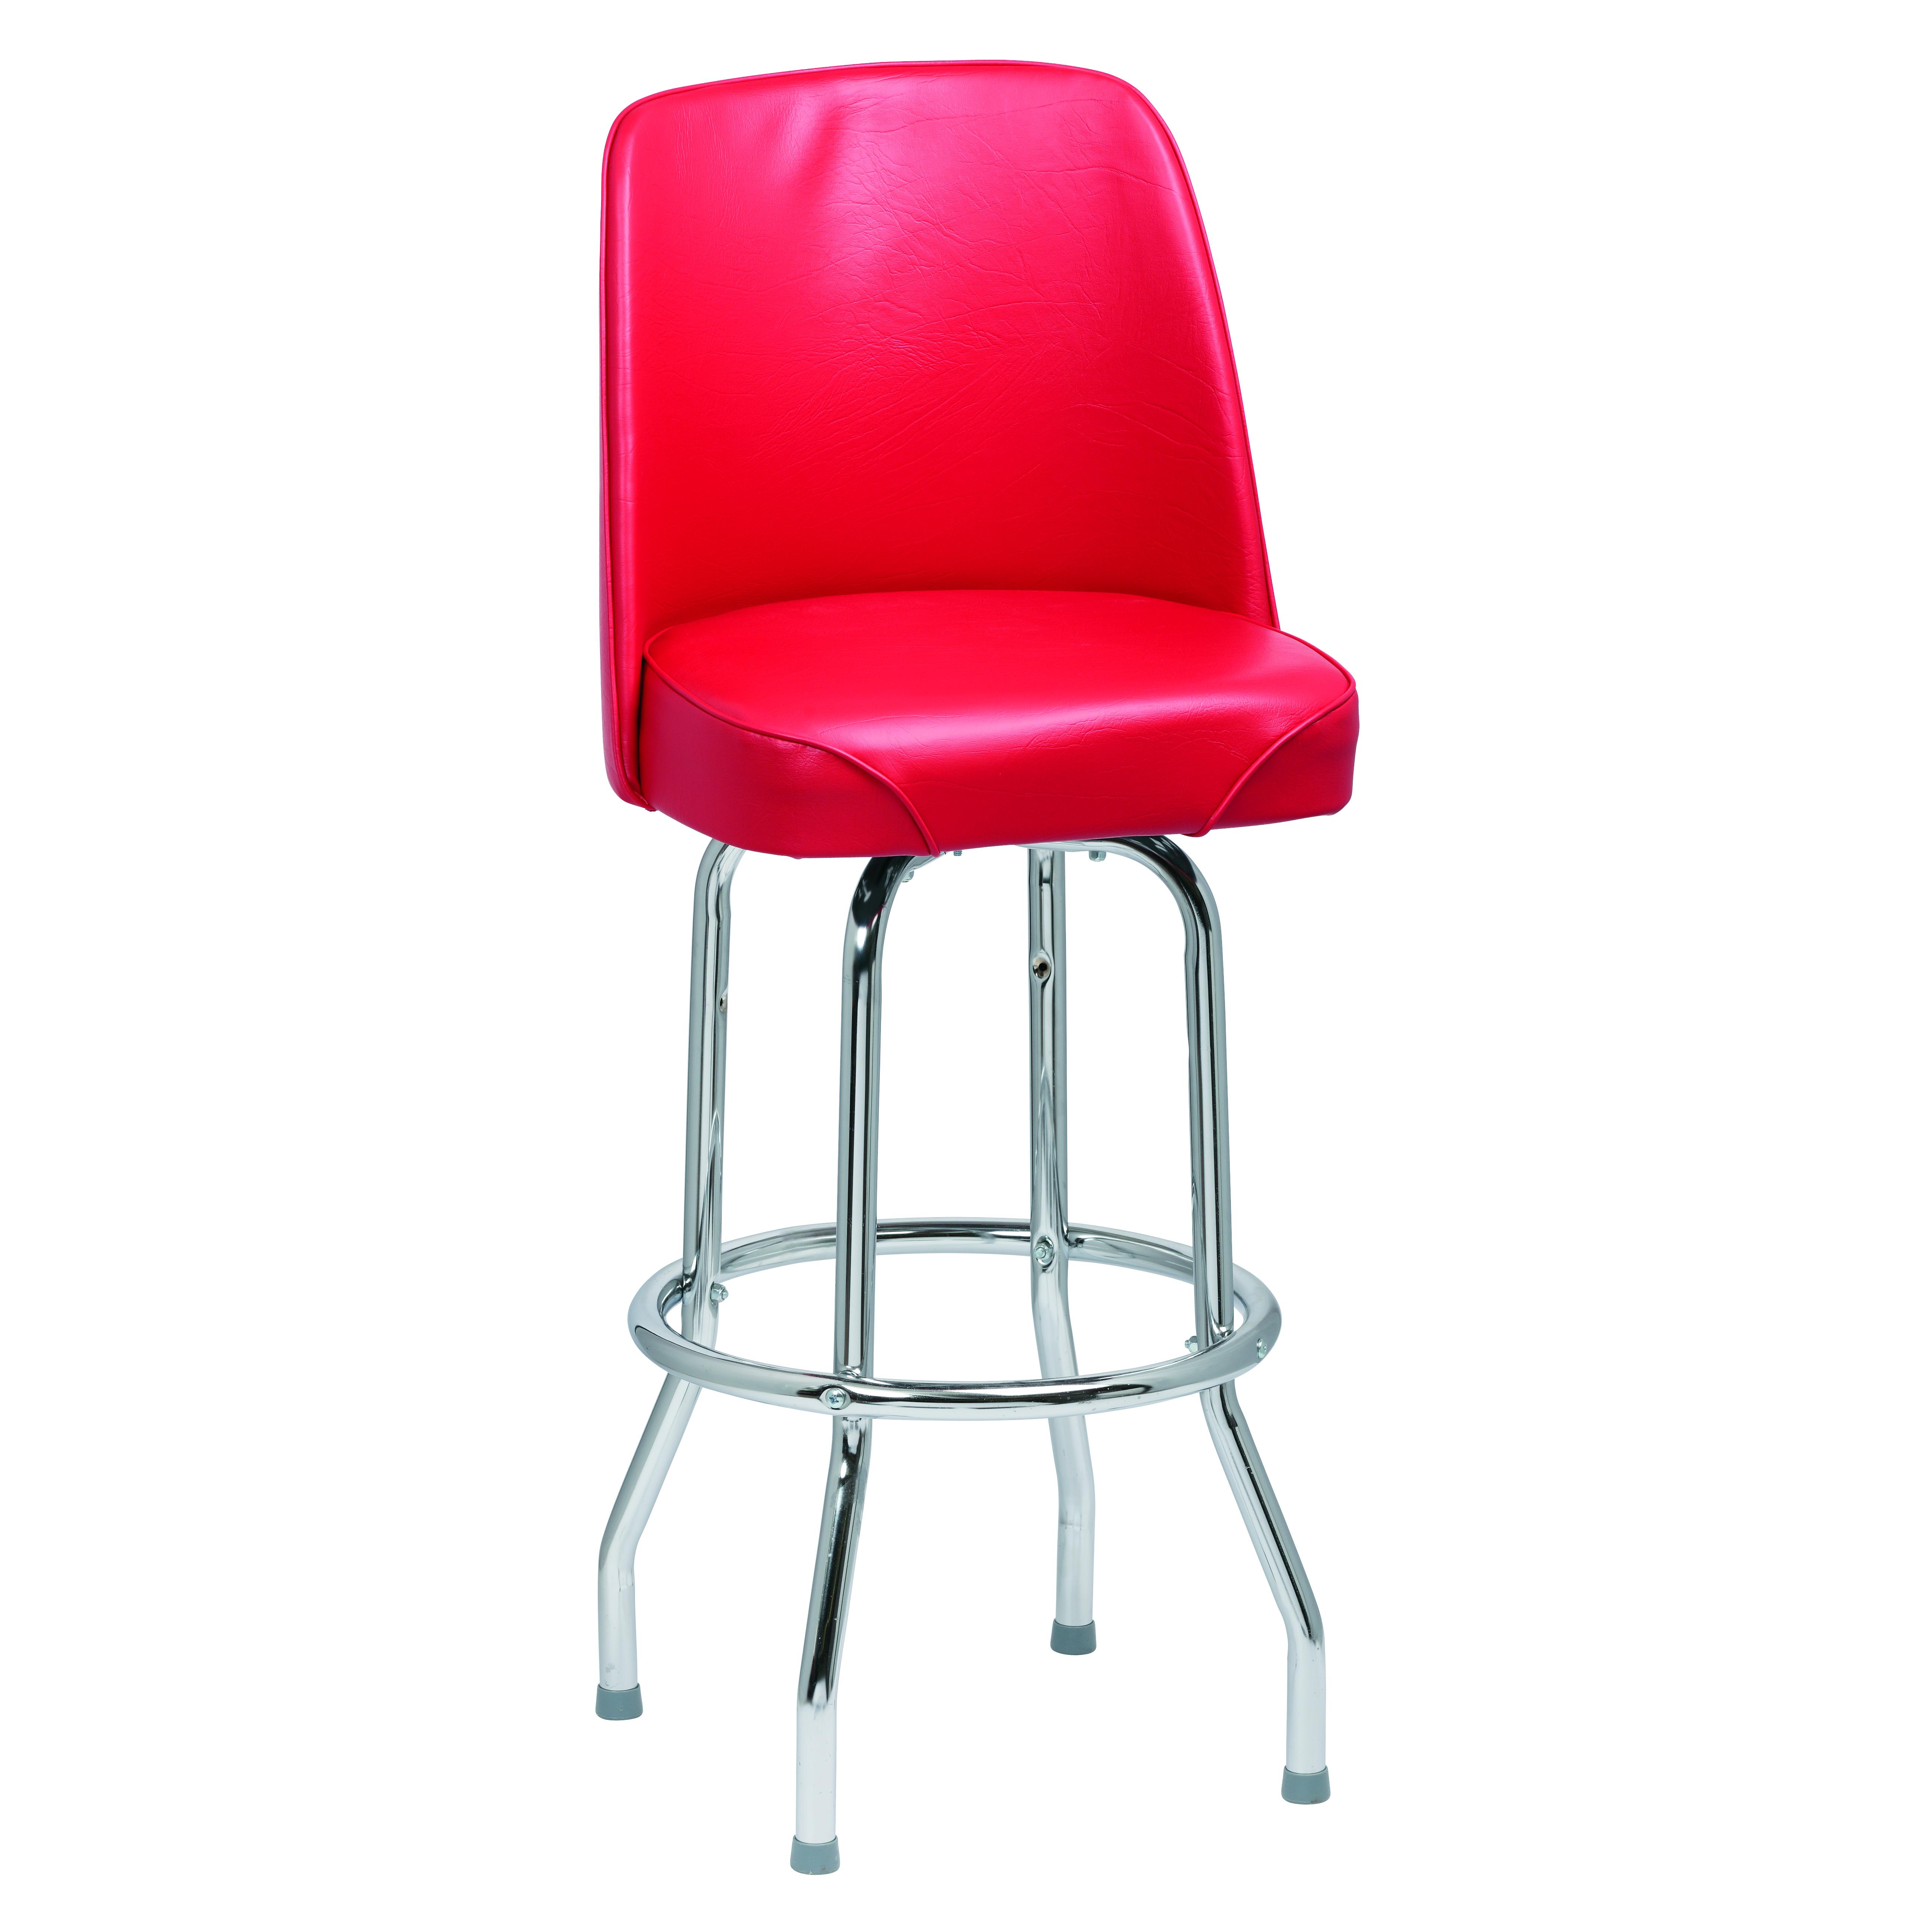 Royal Industries ROY 7721 R bar stool, swivel, indoor